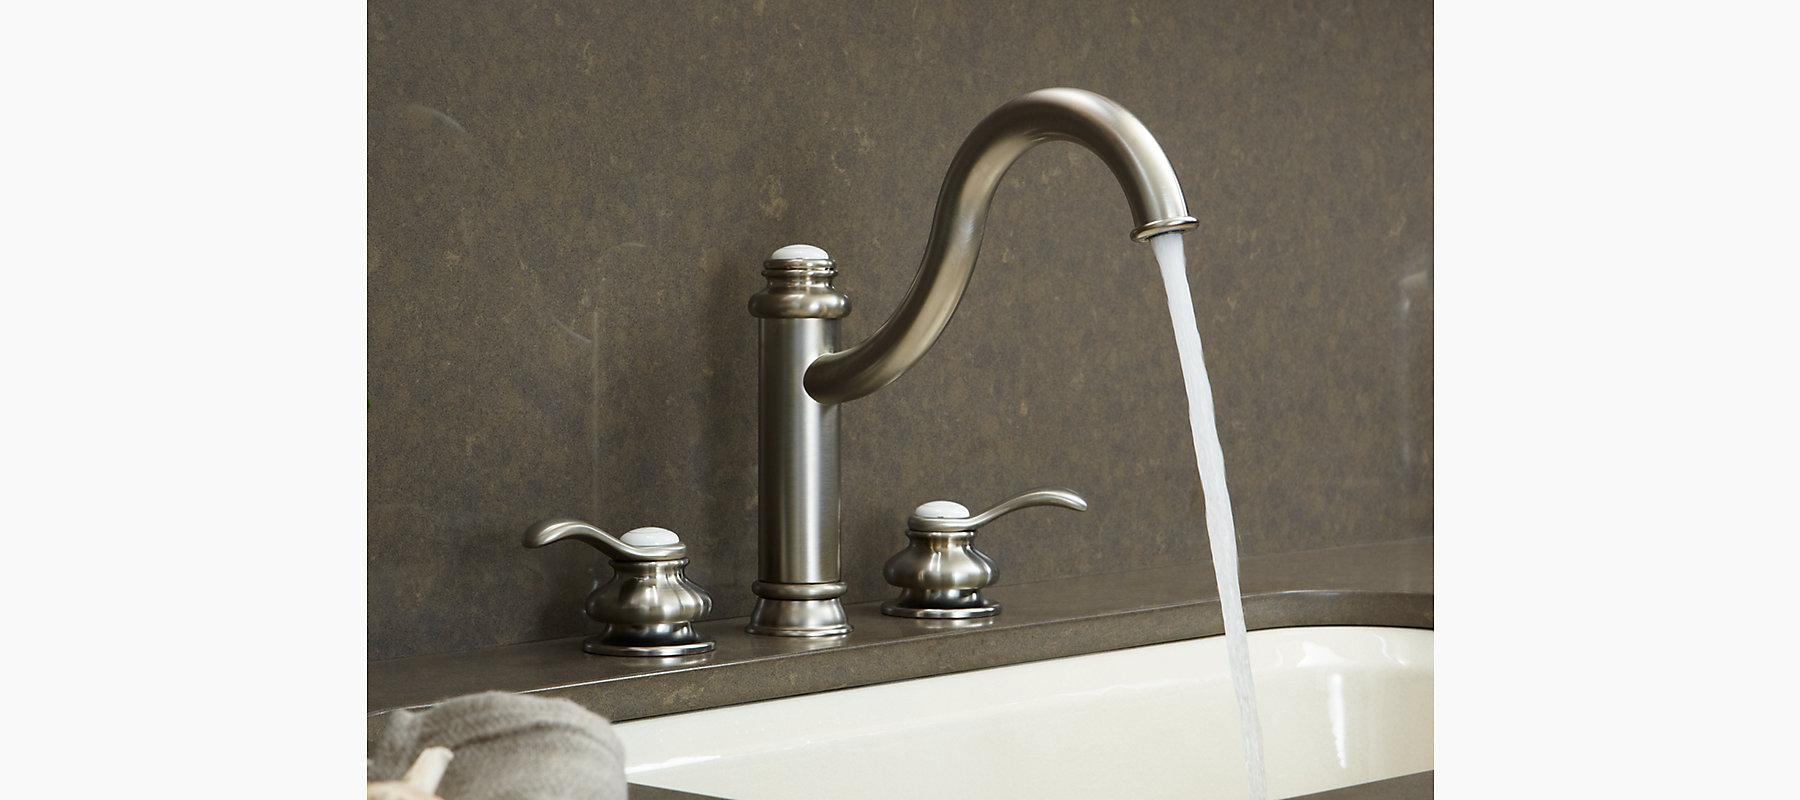 Fairfax High Spout Kitchen Sink Faucet with Lever Handles   K-12230 ...